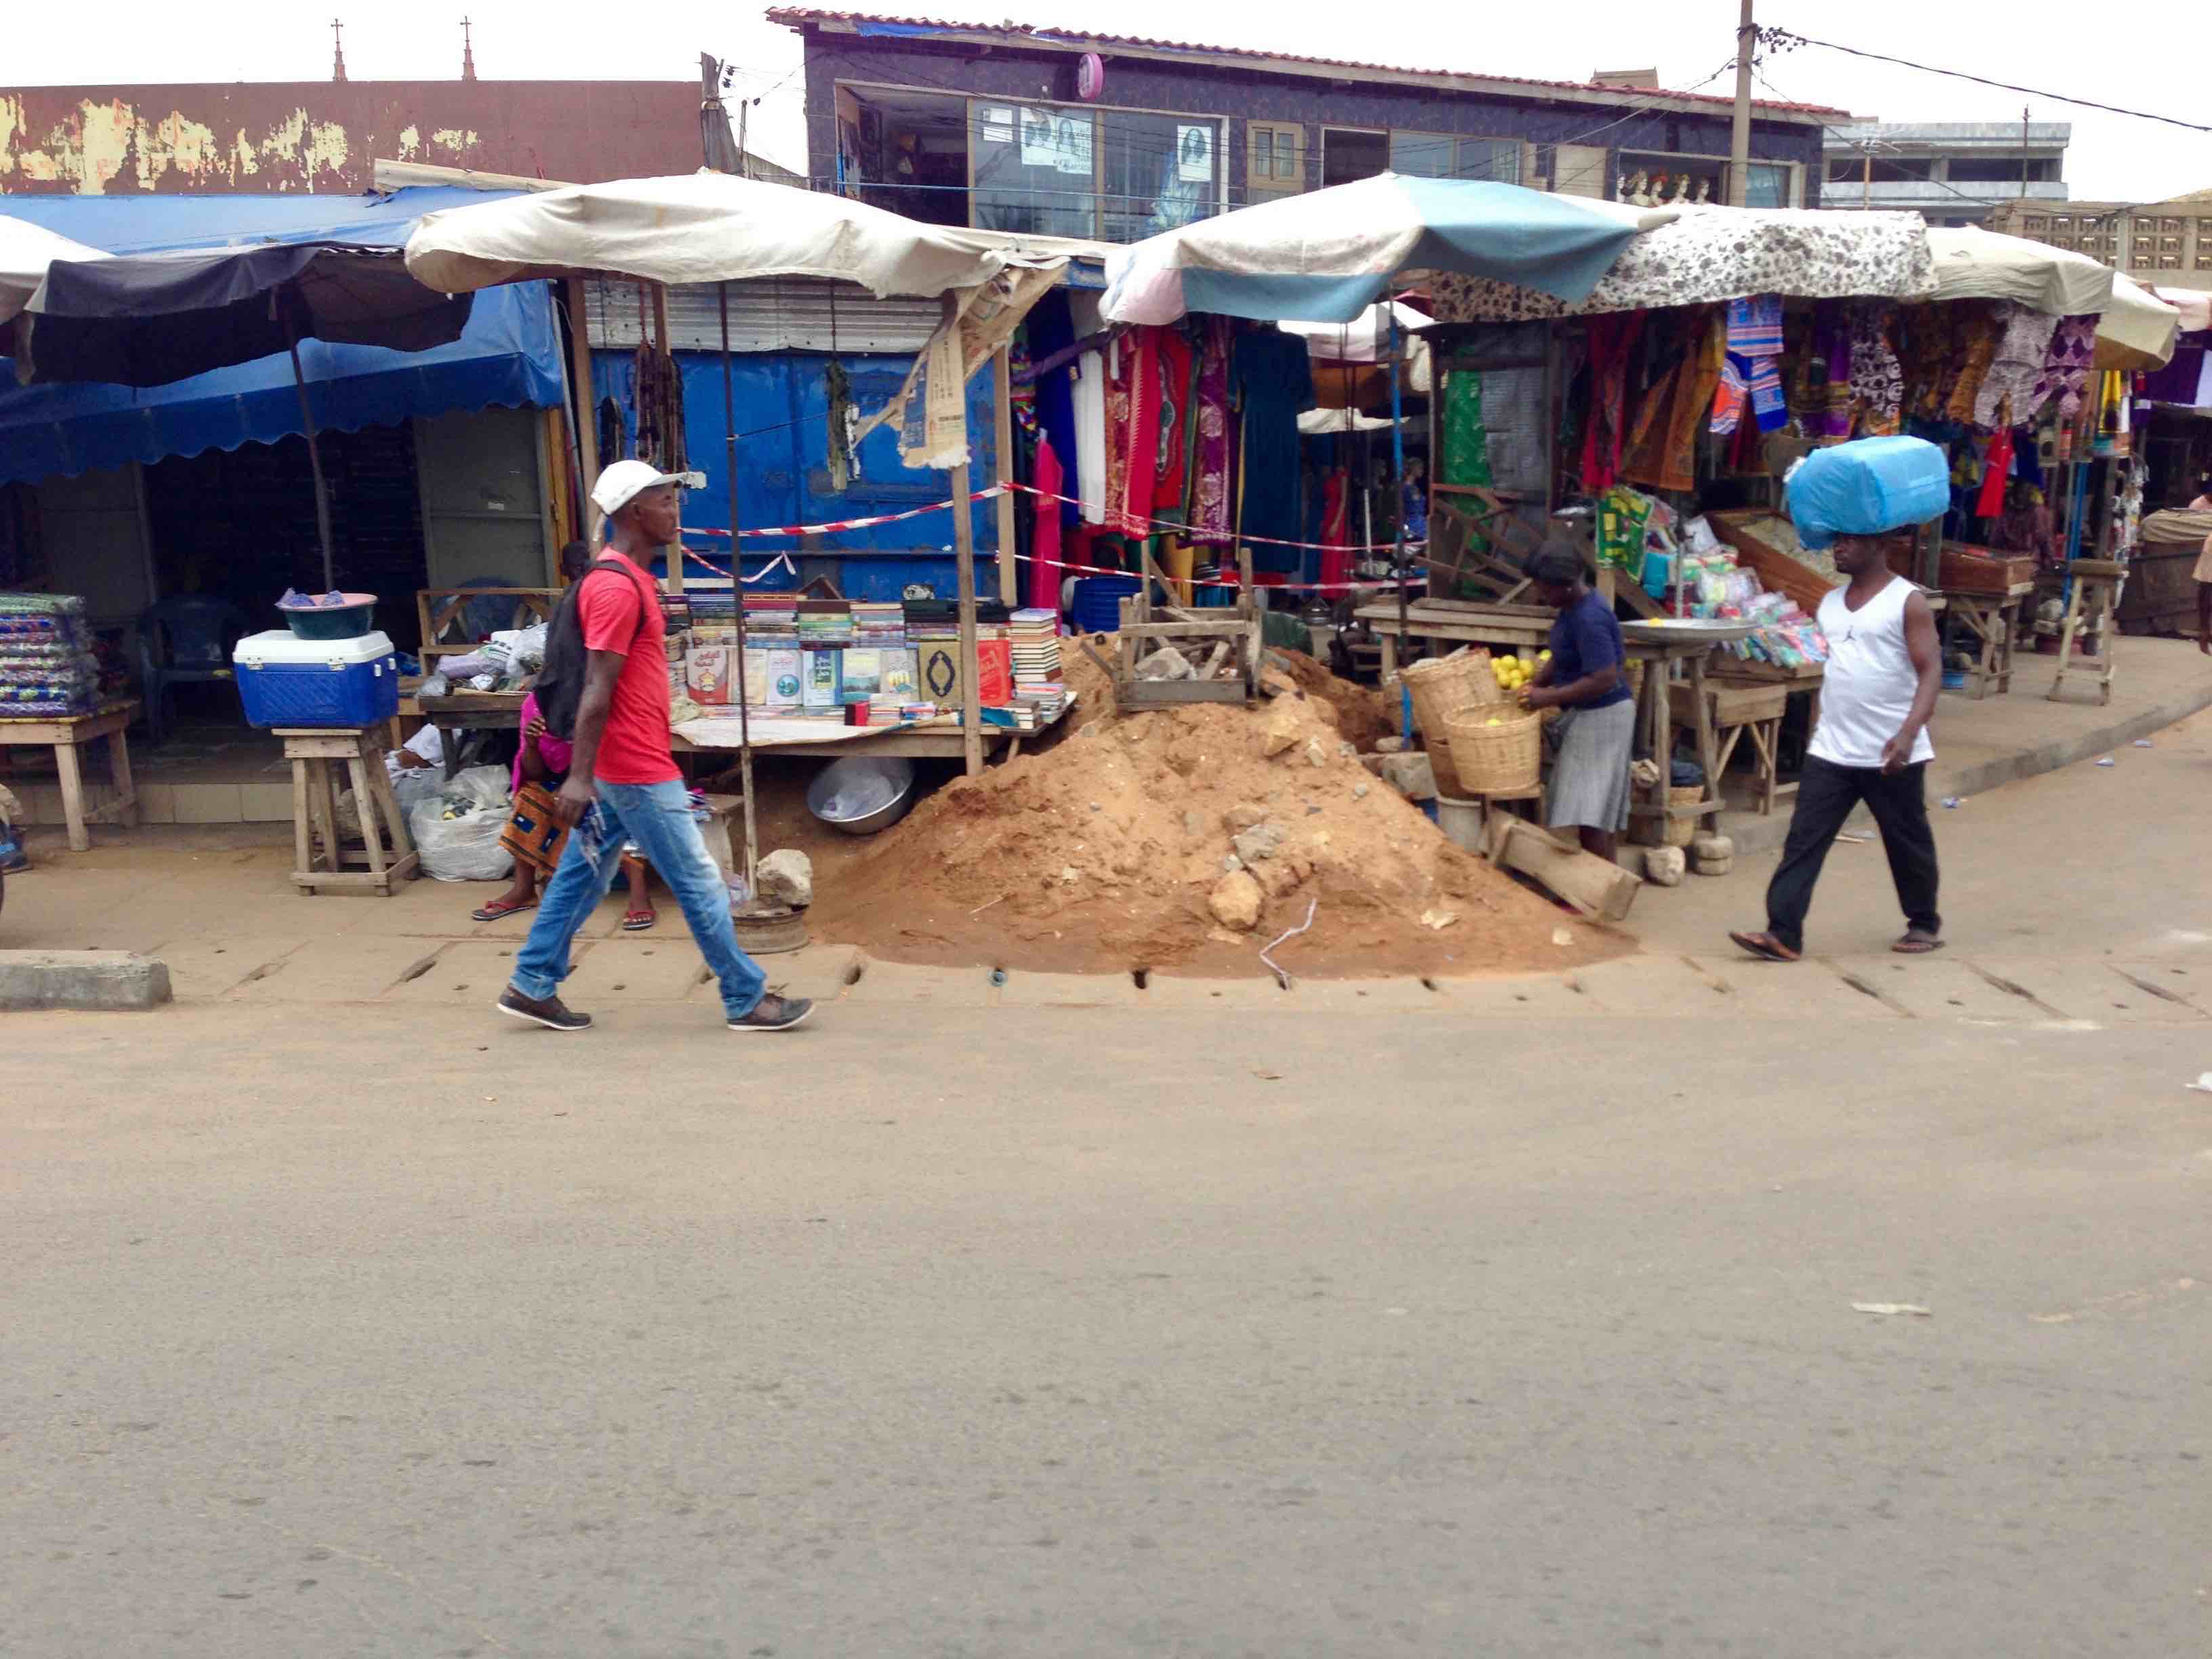 Street market scene, Lome, Togo. #JujuFilms